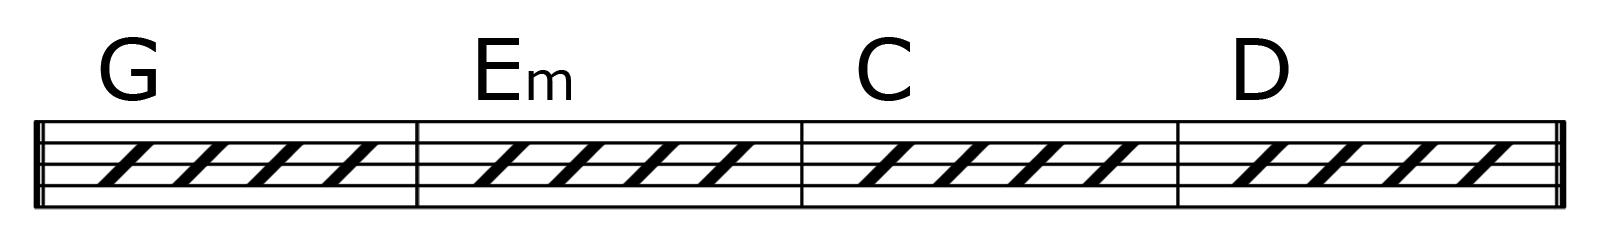 Crash Course Chord Progression 2.png